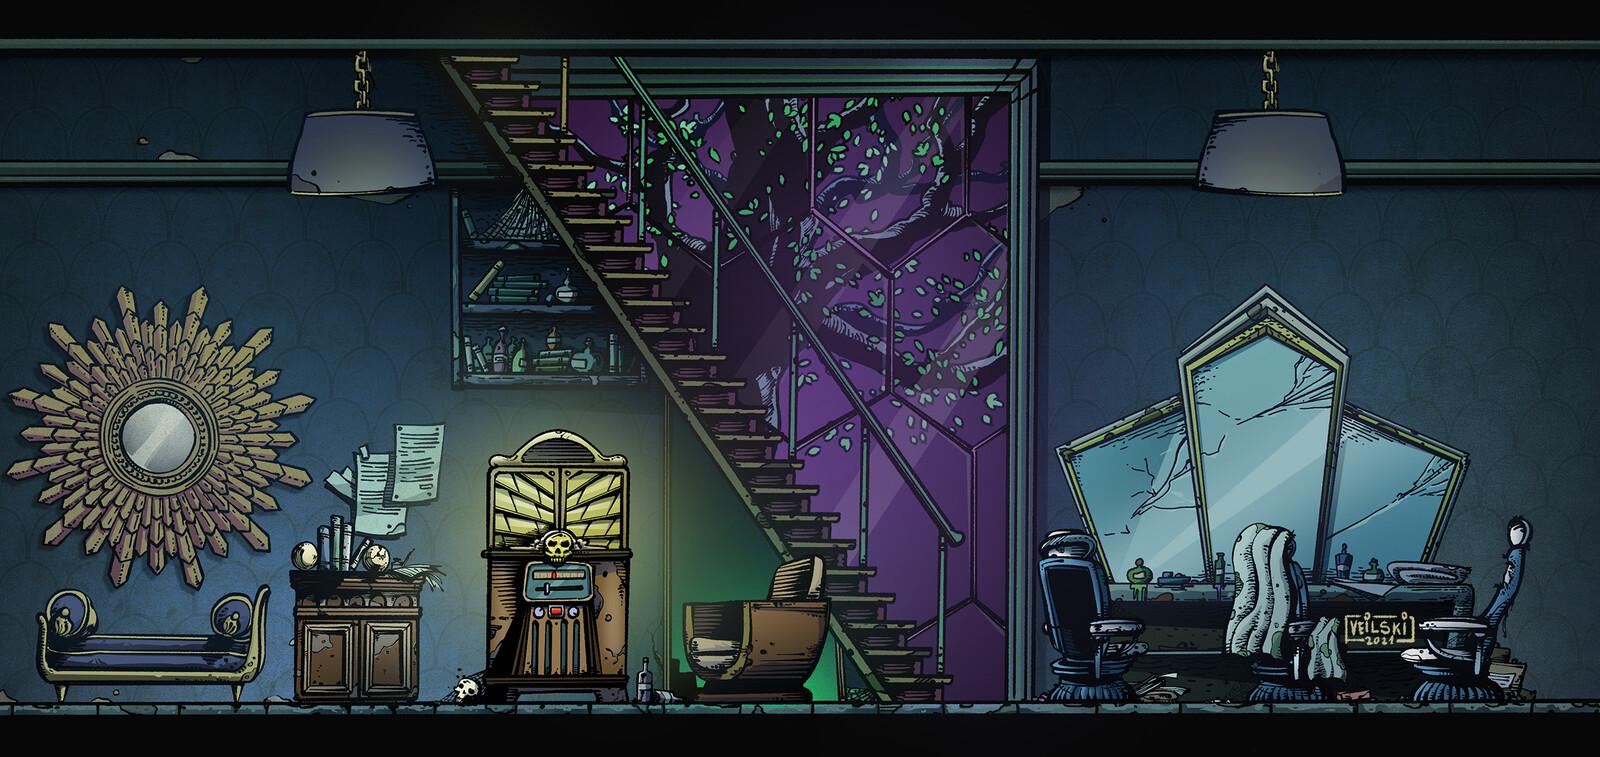 Occultputer pt.2 - Living room